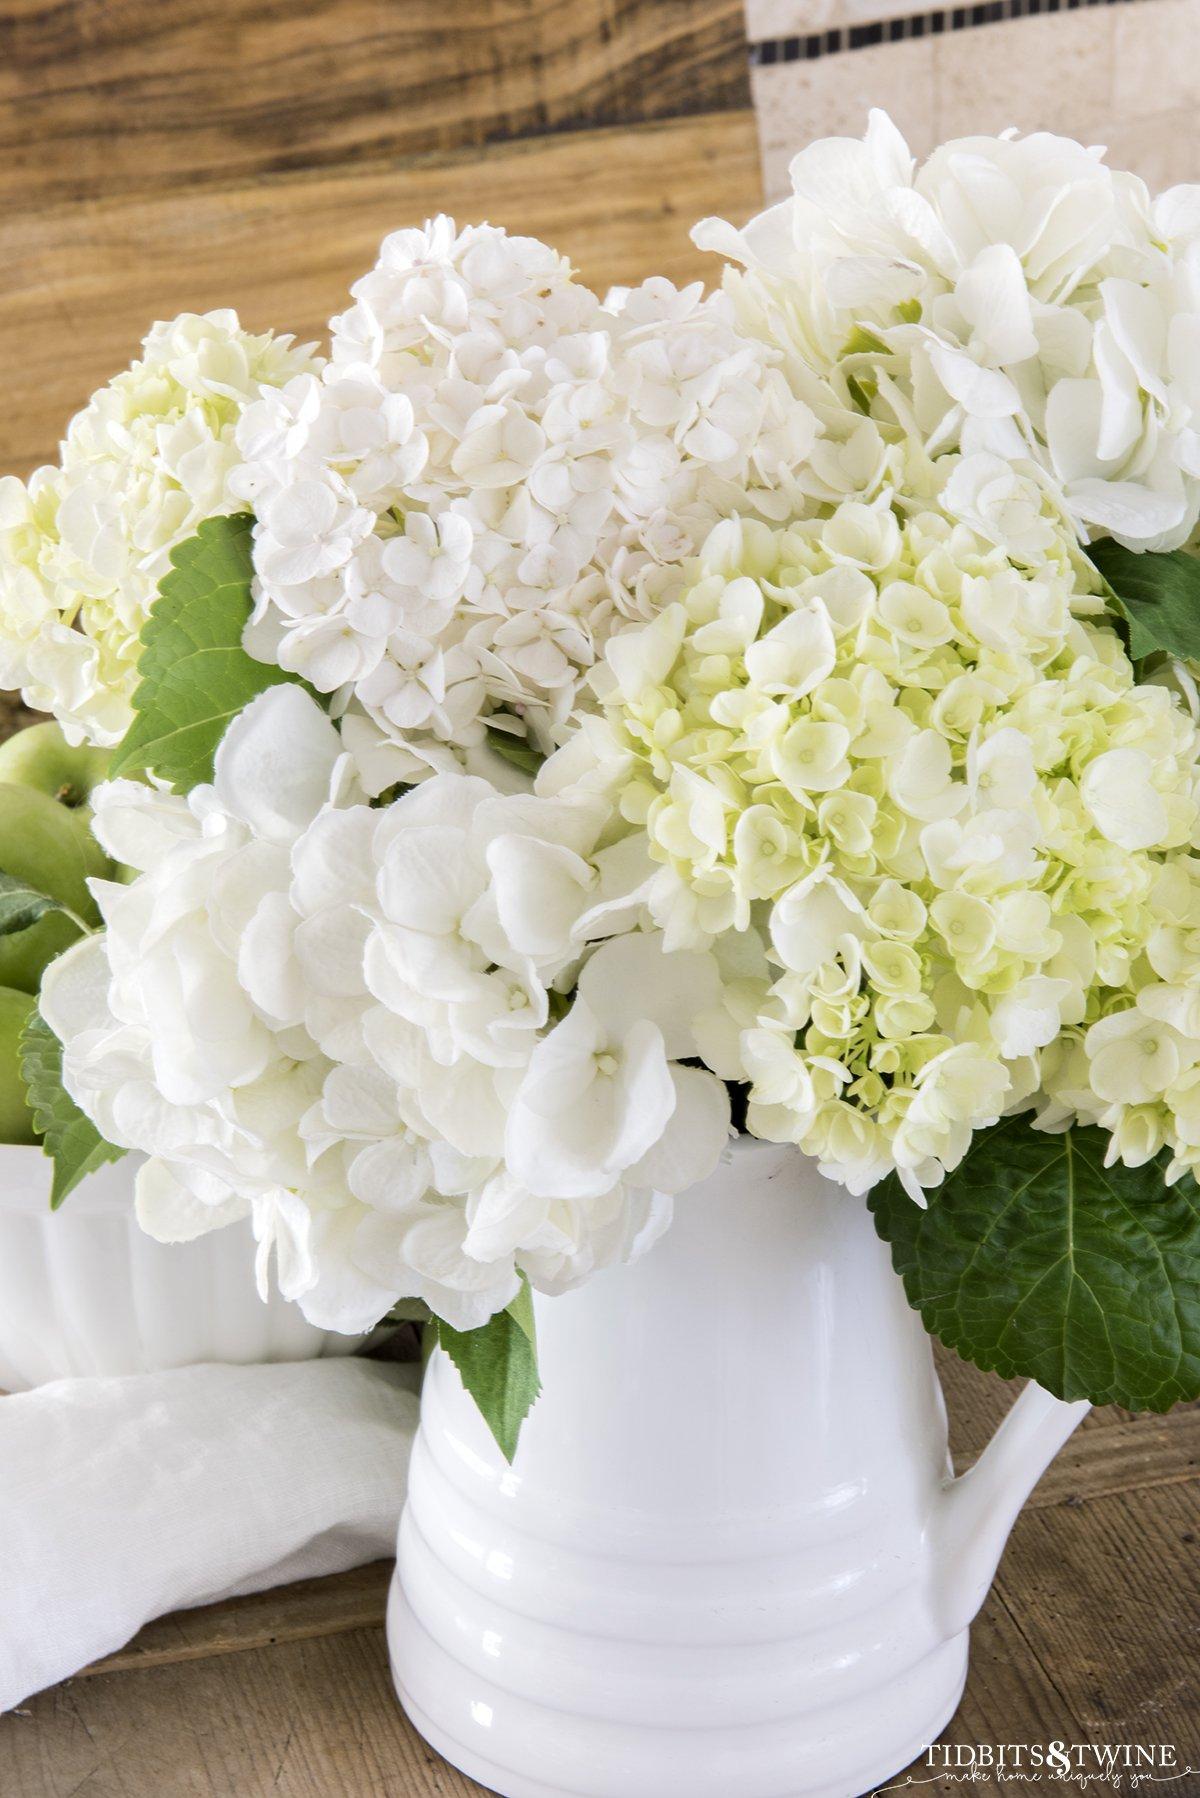 Closeup of white hydrangeas in a white pitcher